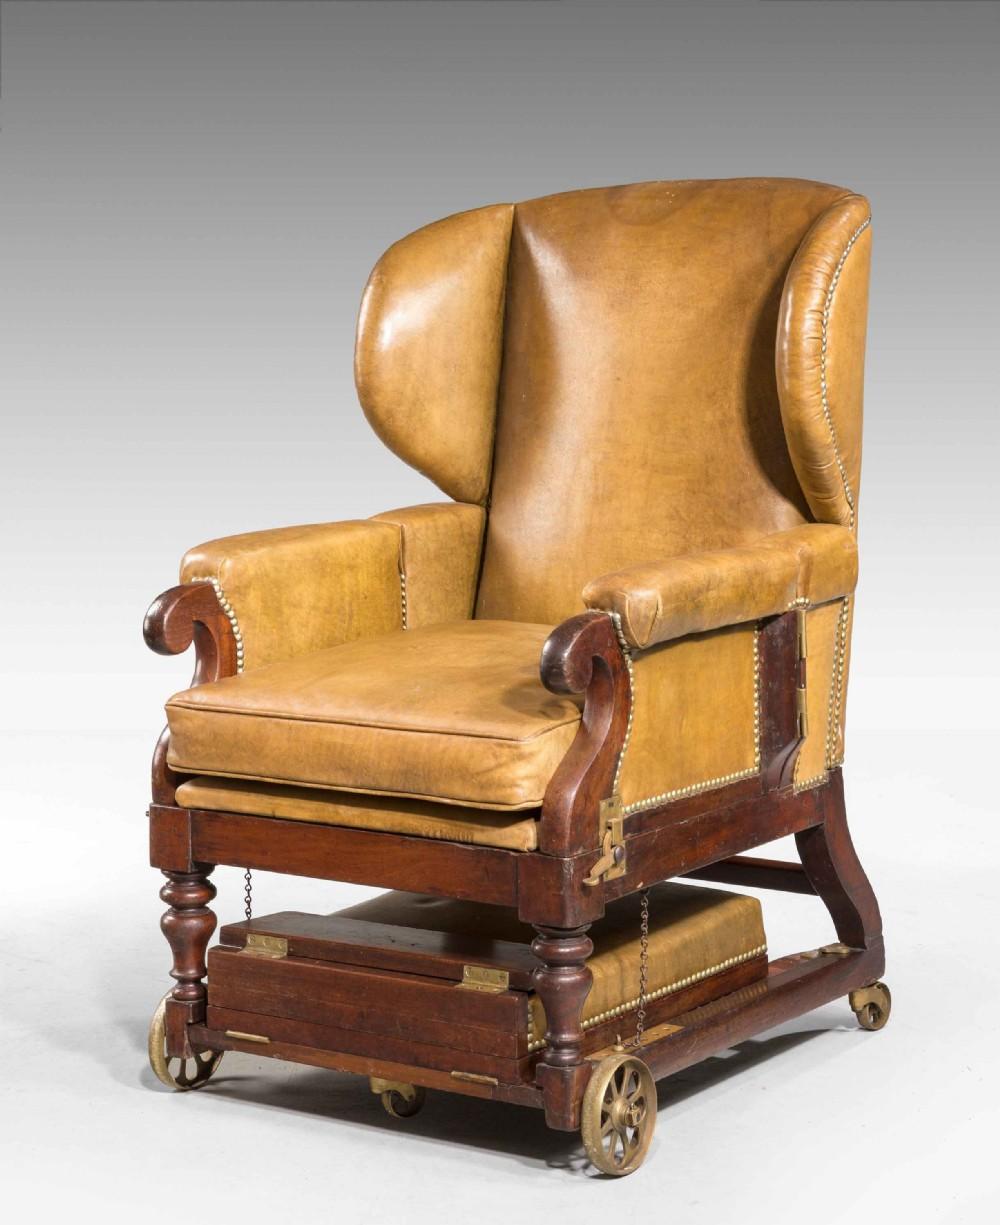 19th century invalids' chair stamped j ward